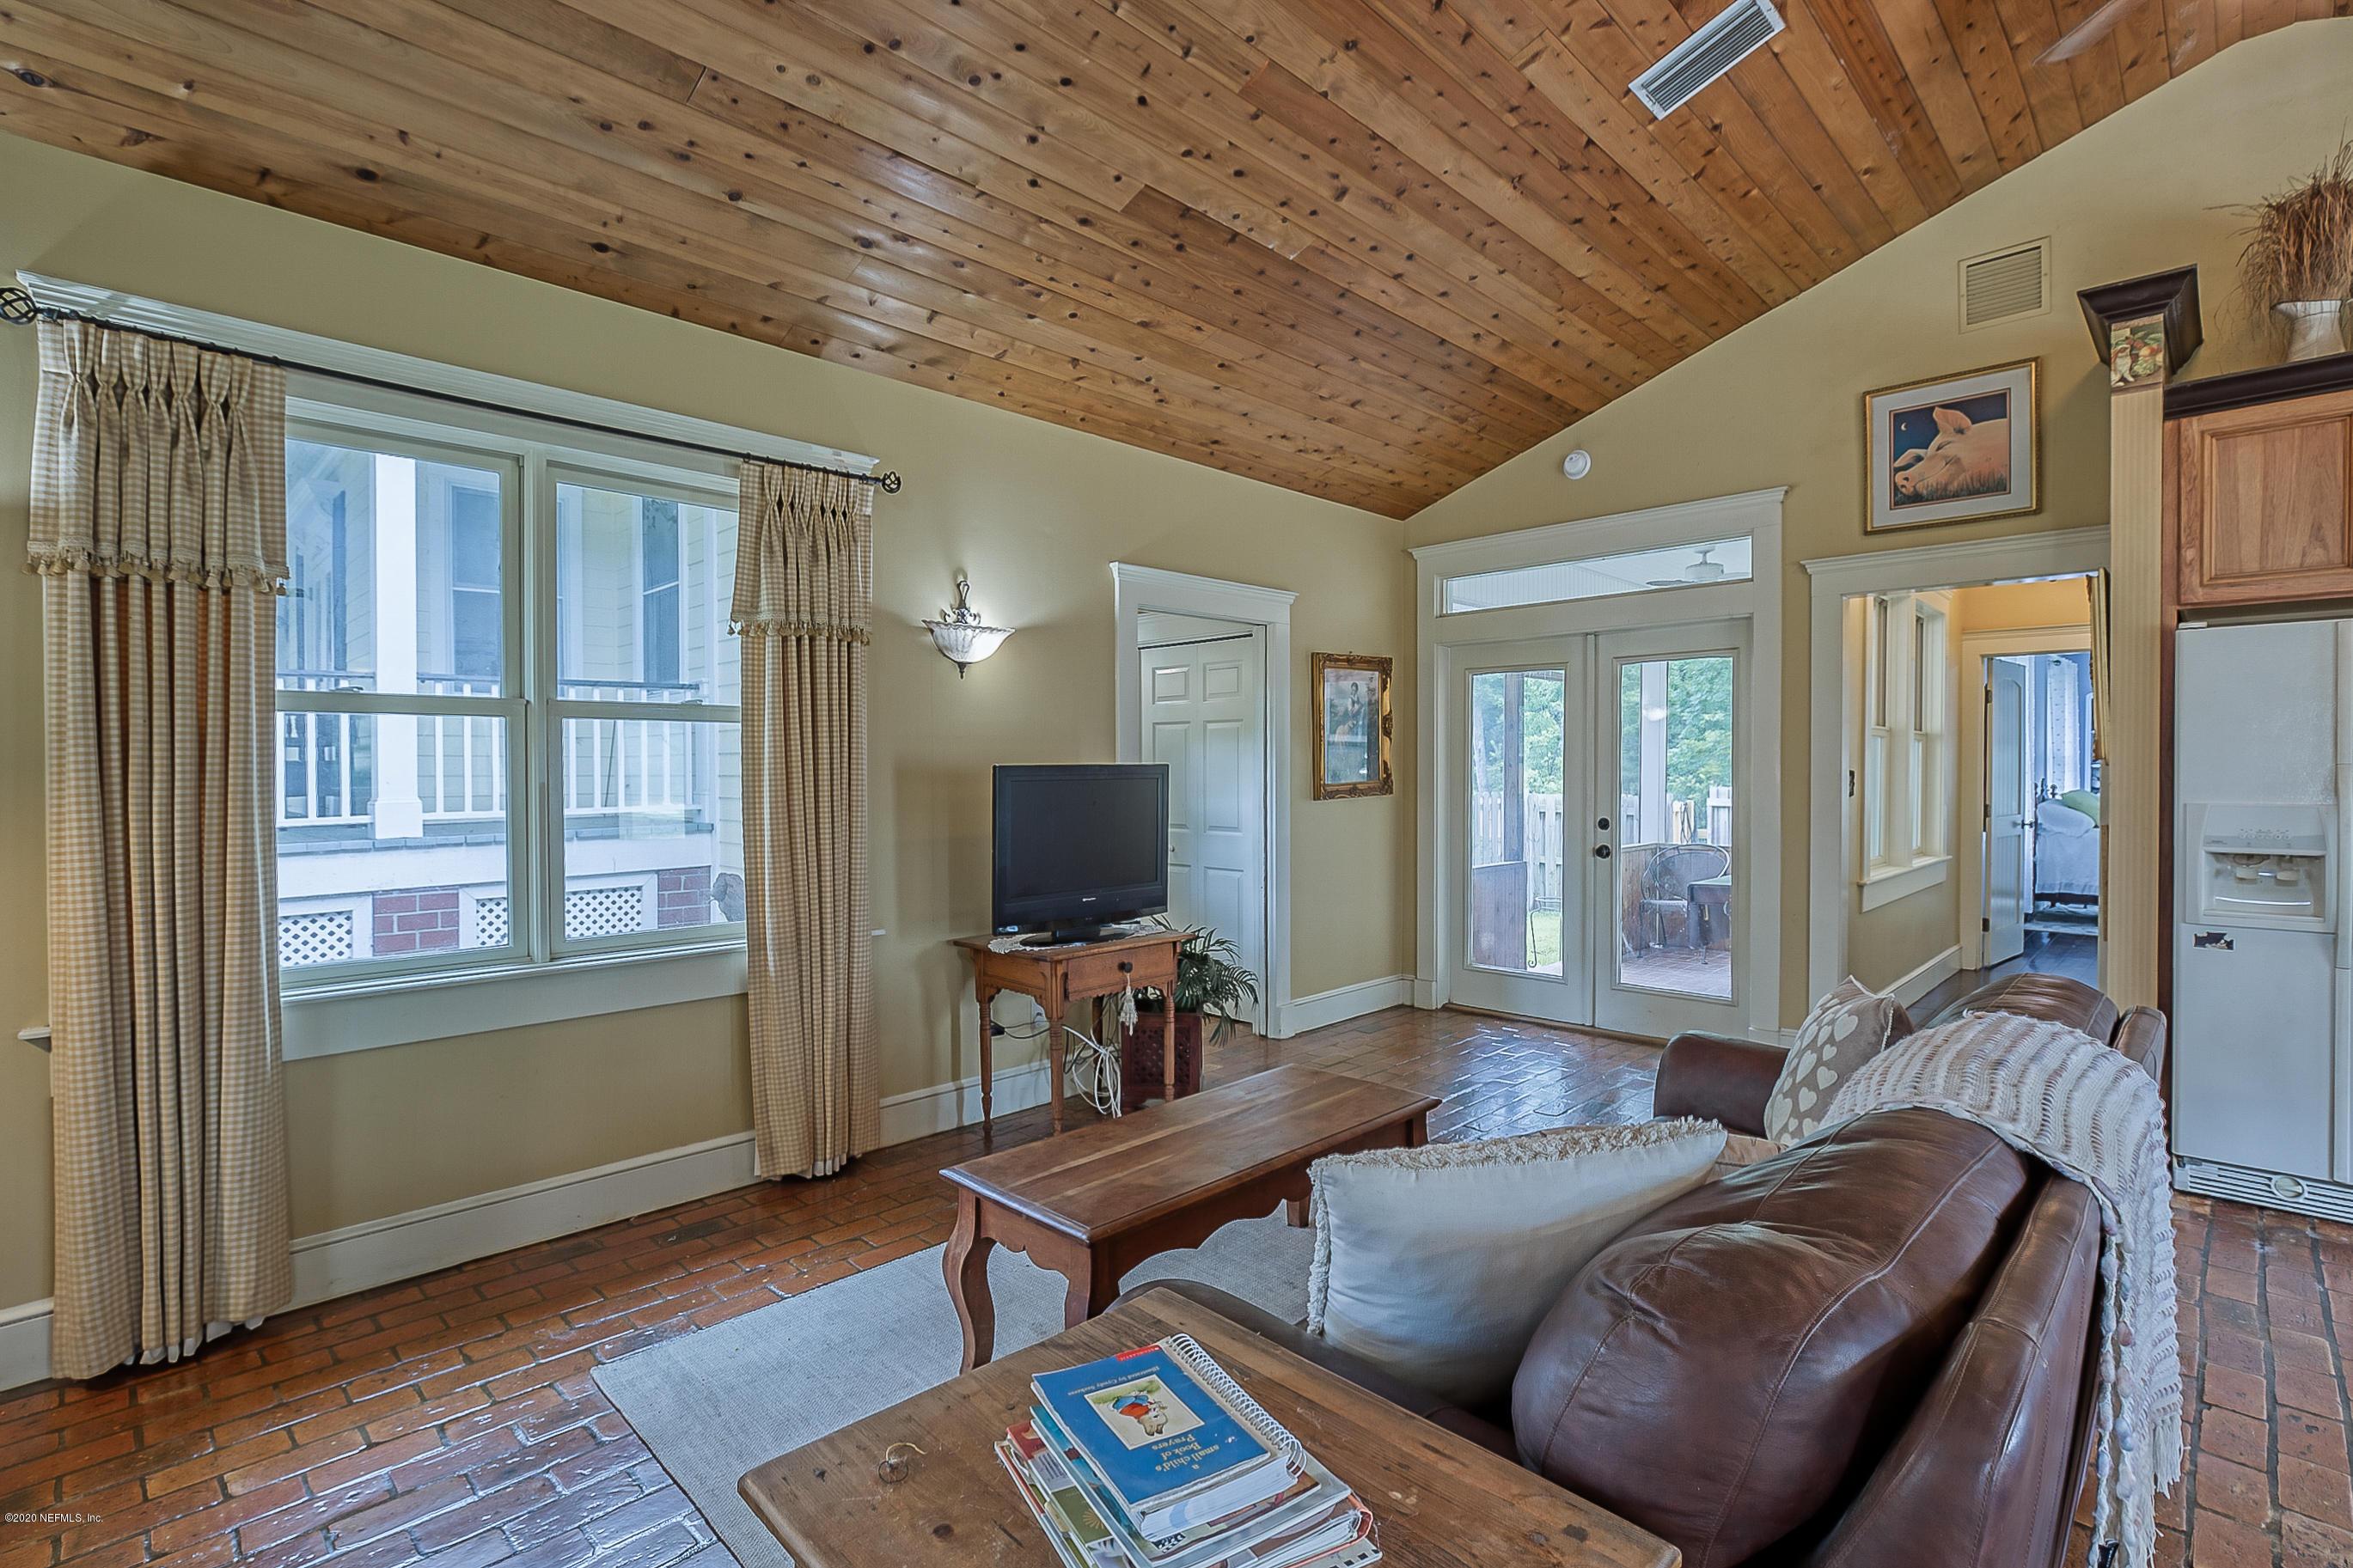 3900 OLDFIELD, JACKSONVILLE, FLORIDA 32223, 4 Bedrooms Bedrooms, ,4 BathroomsBathrooms,Residential,For sale,OLDFIELD,1057155